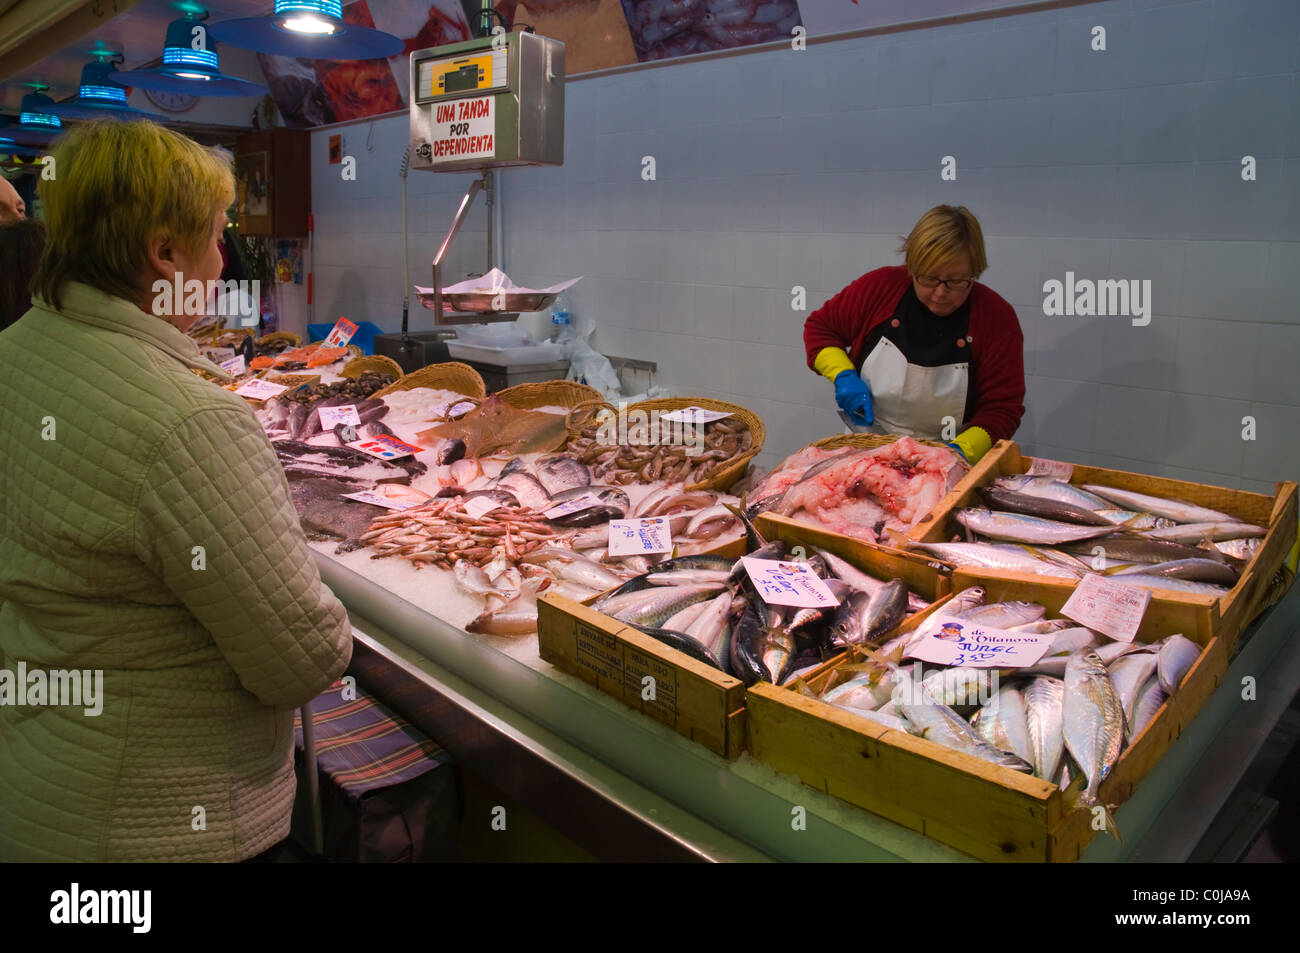 Seafood stall inside new Mercat de Sant Antoni market hall central Barcelona Catalunya Spain Europe - Stock Image